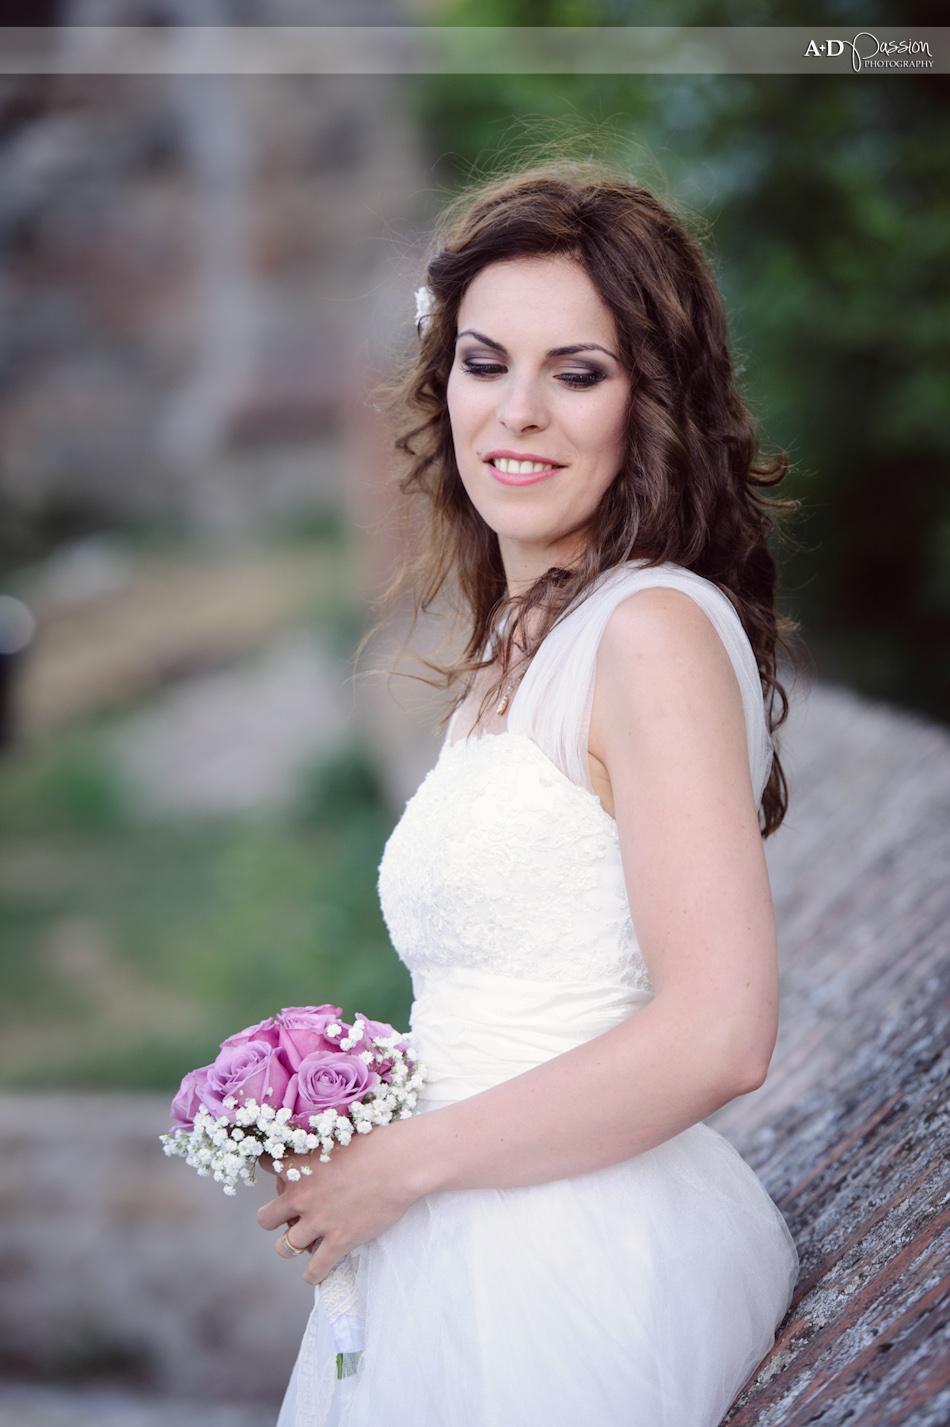 AD Passion Photography | ad-passion_fotograf-profesionist-nunta_sedinta-foto-dupa-nunta-la-sighisoara_after-wedding_trash-the-dress_nunta-sighisoara_fine-art-photography_alisa-si-ovidiu_0003 | Adelin, Dida, fotograf profesionist, fotograf de nunta, fotografie de nunta, fotograf Timisoara, fotograf Craiova, fotograf Bucuresti, fotograf Arad, nunta Timisoara, nunta Arad, nunta Bucuresti, nunta Craiova